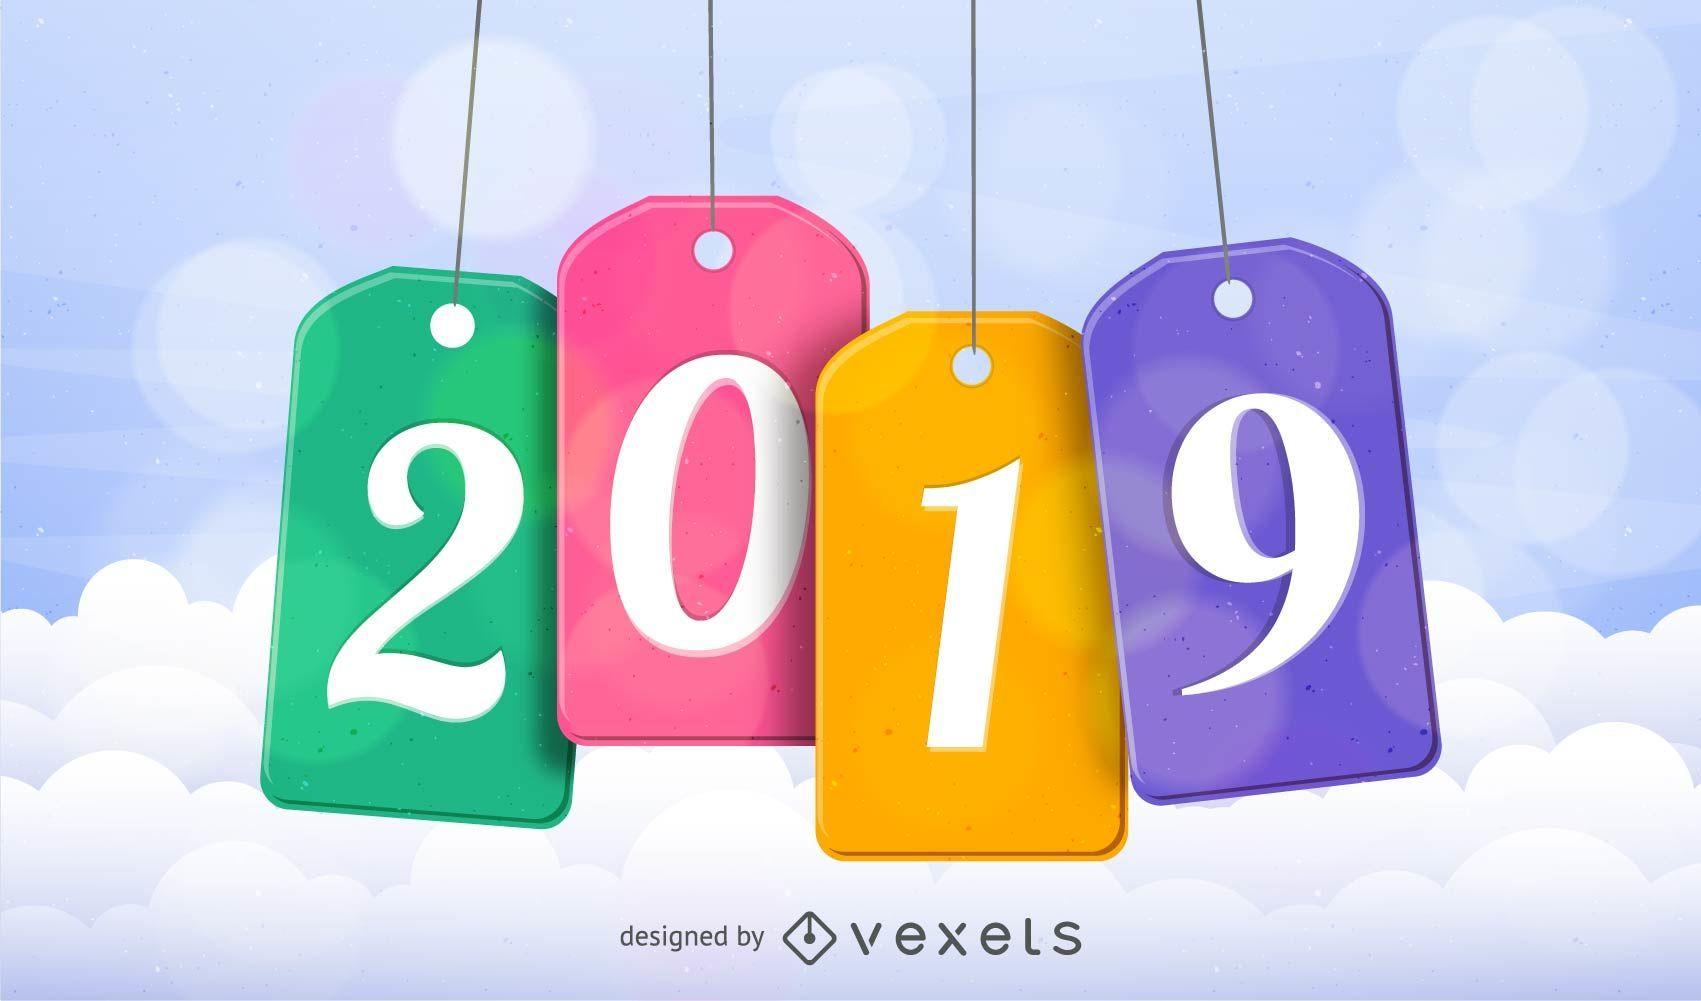 2019 hanging tags design